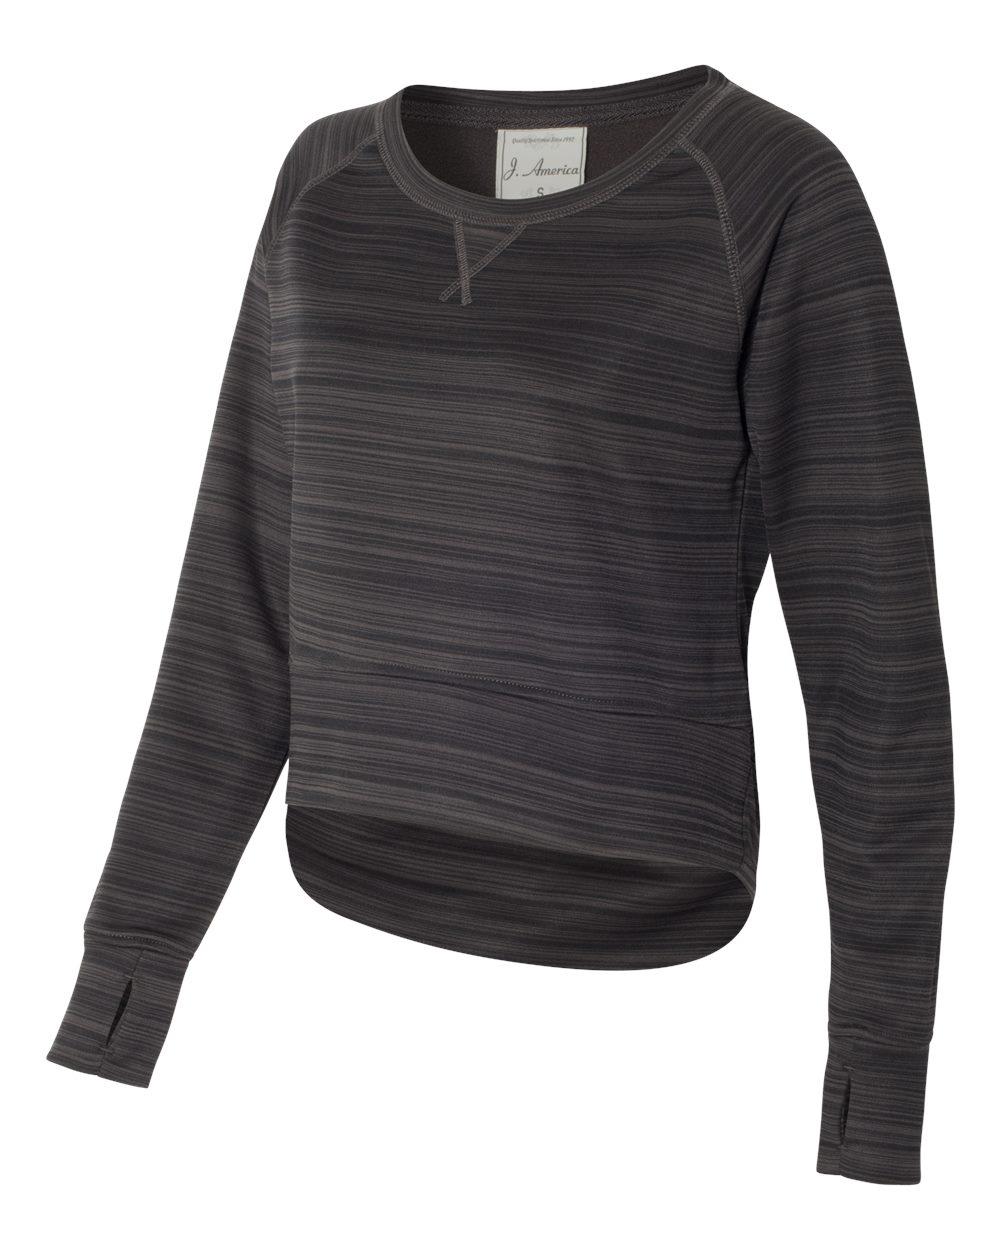 J. America 8663 - Women's Odyssey Striped Performance Fleece Hi-Lo Crewneck Sweatshirt